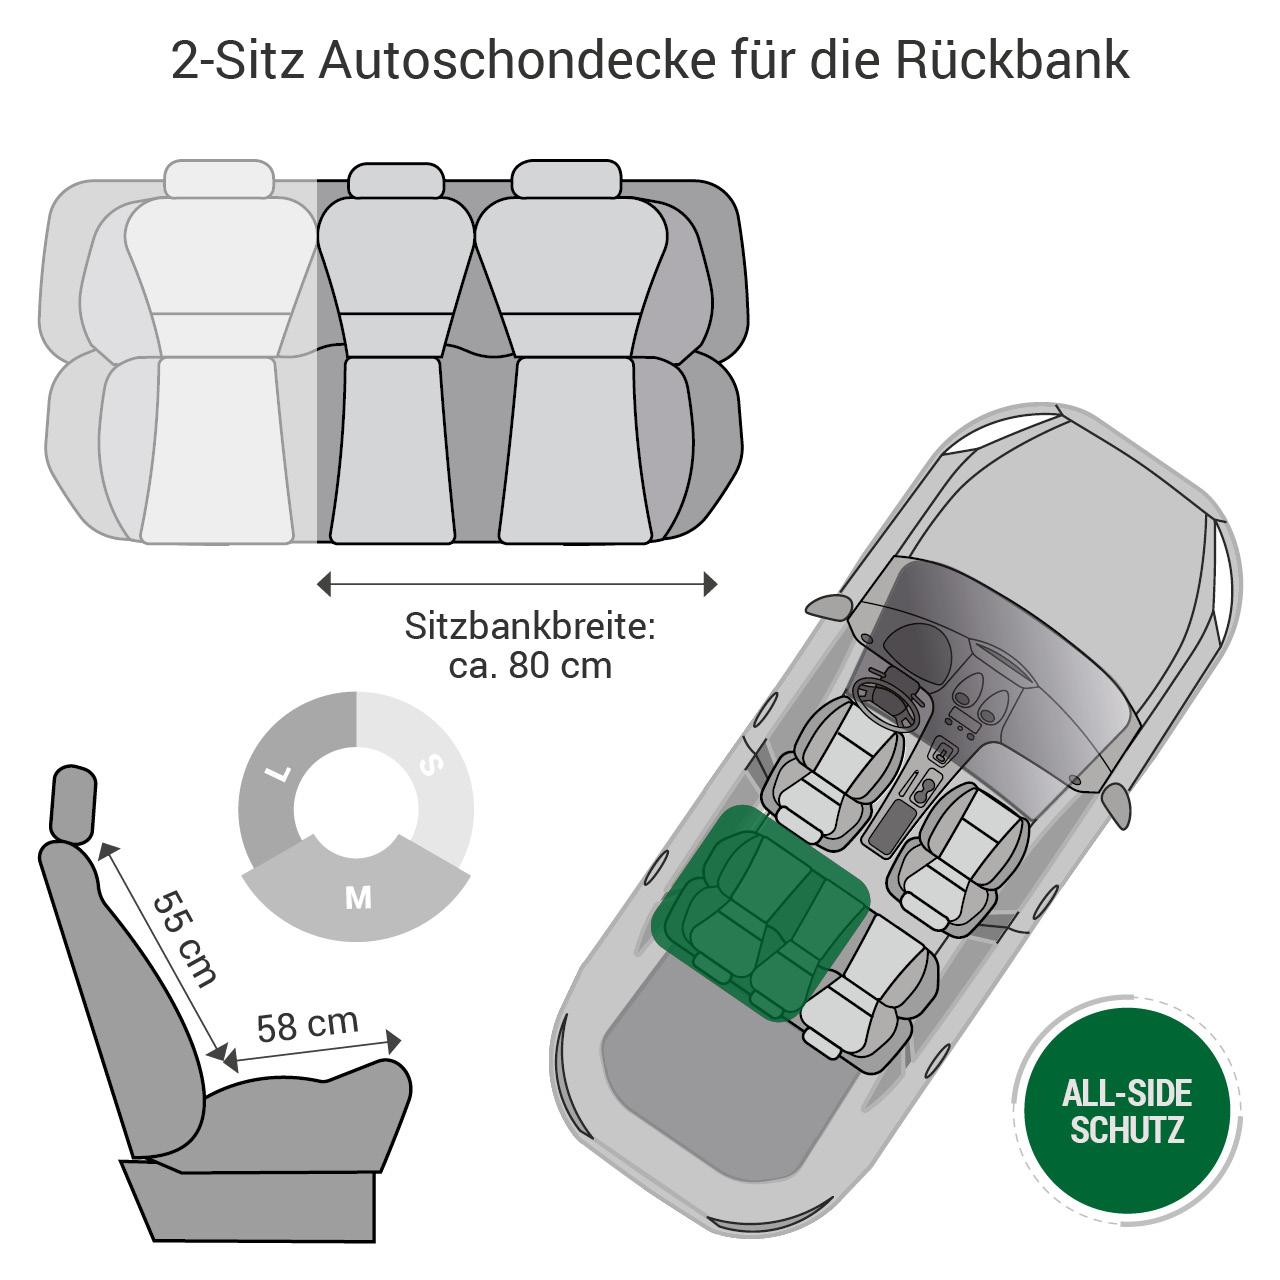 Doctor Bark - Autoschondecke für Hunde - Rückbank 2-Sitz Gr. M - braun